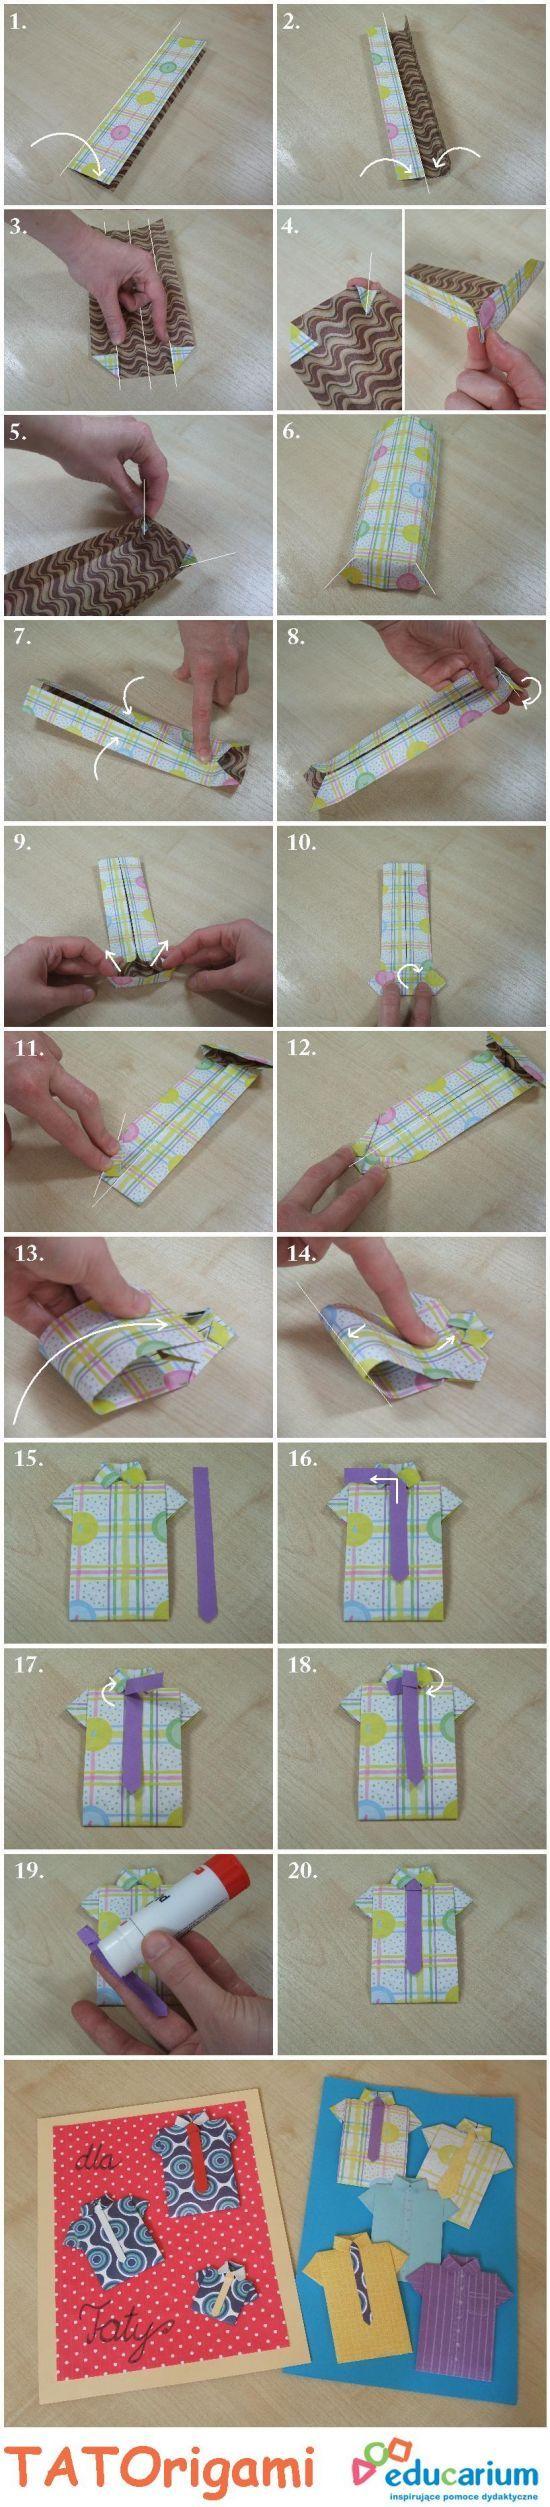 Koszula origami krok po kroku